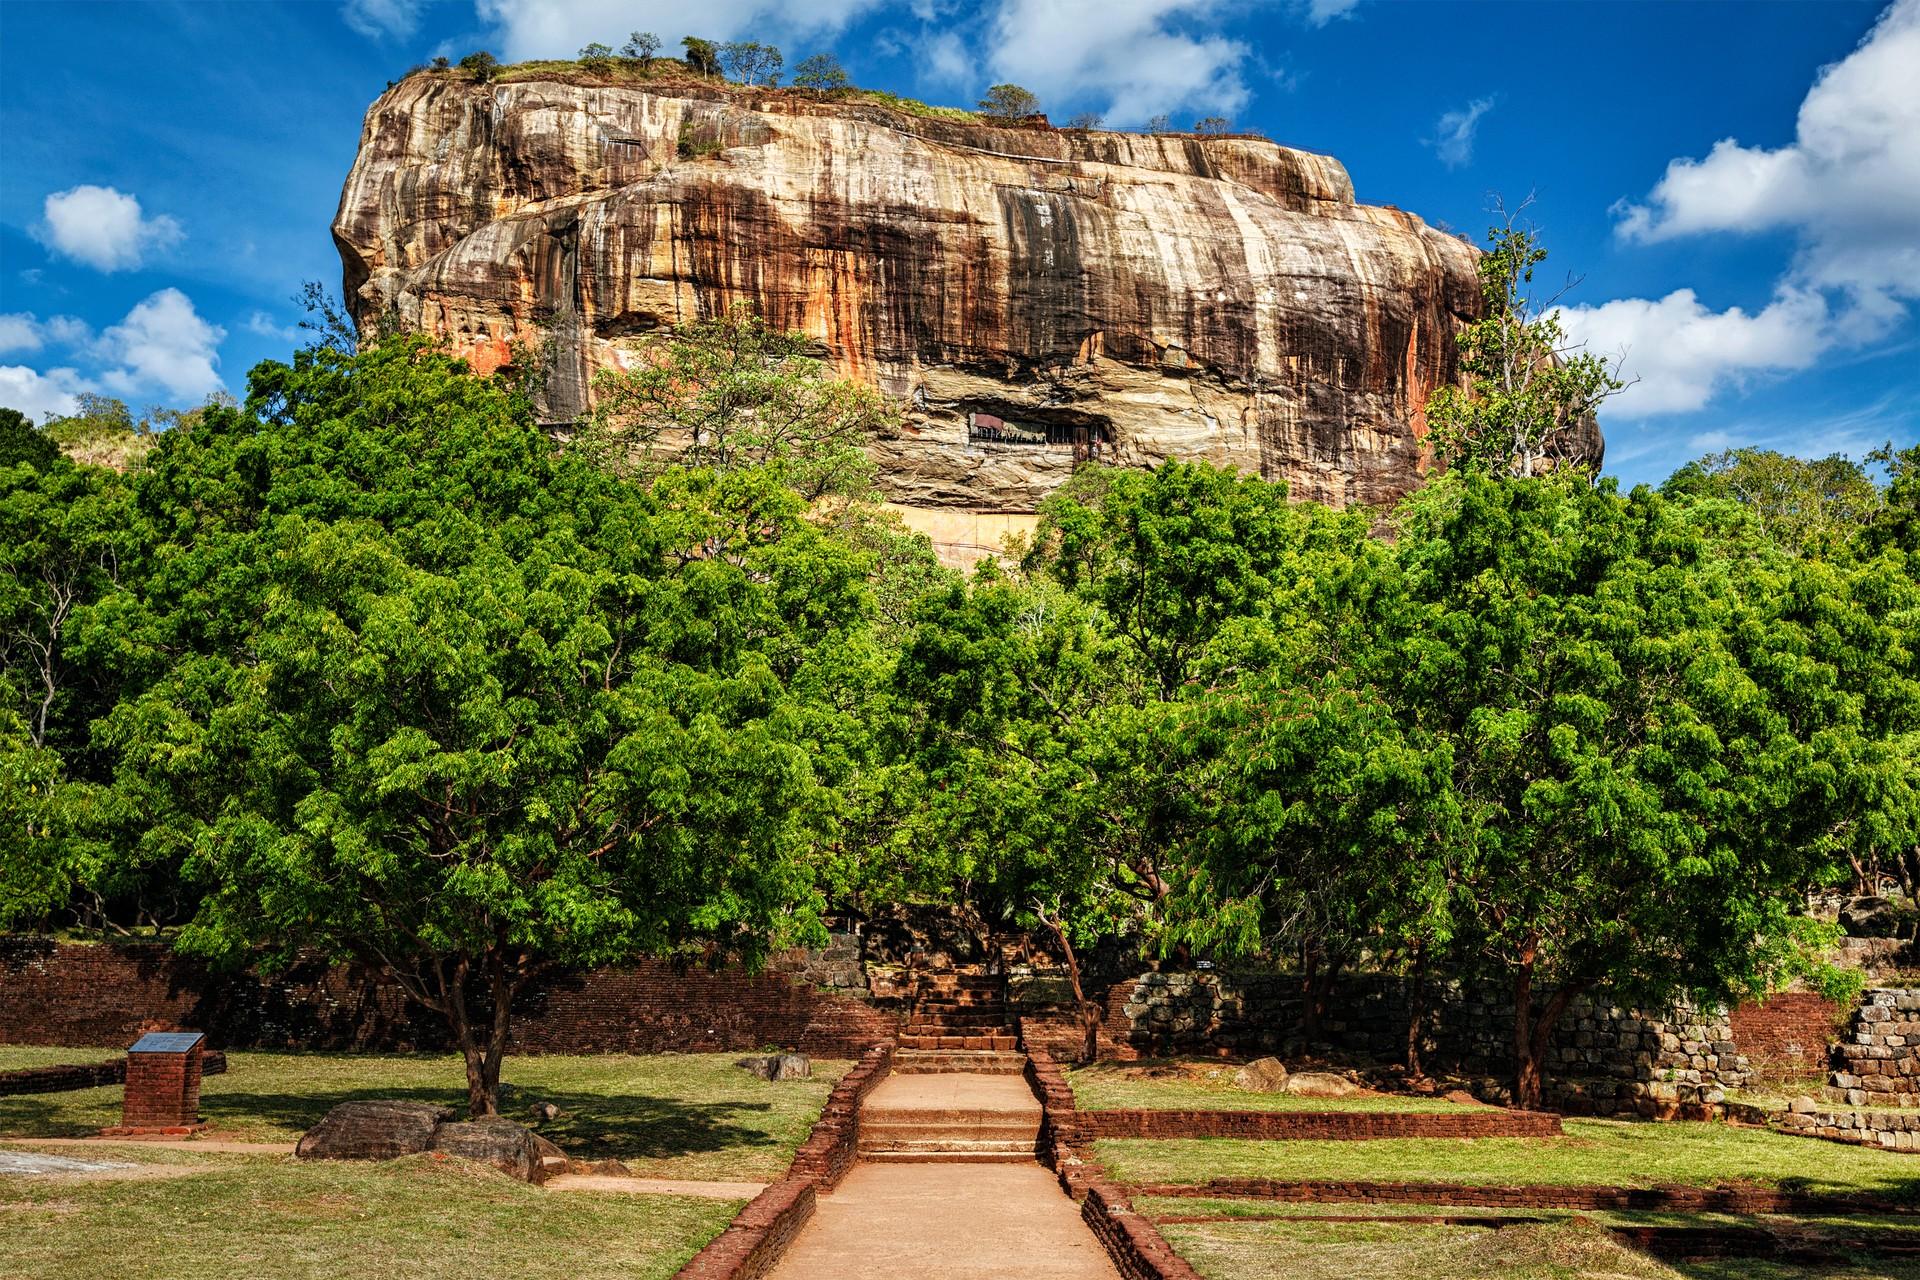 Sri Lanka holidays: Sigiriya lion rock fortress